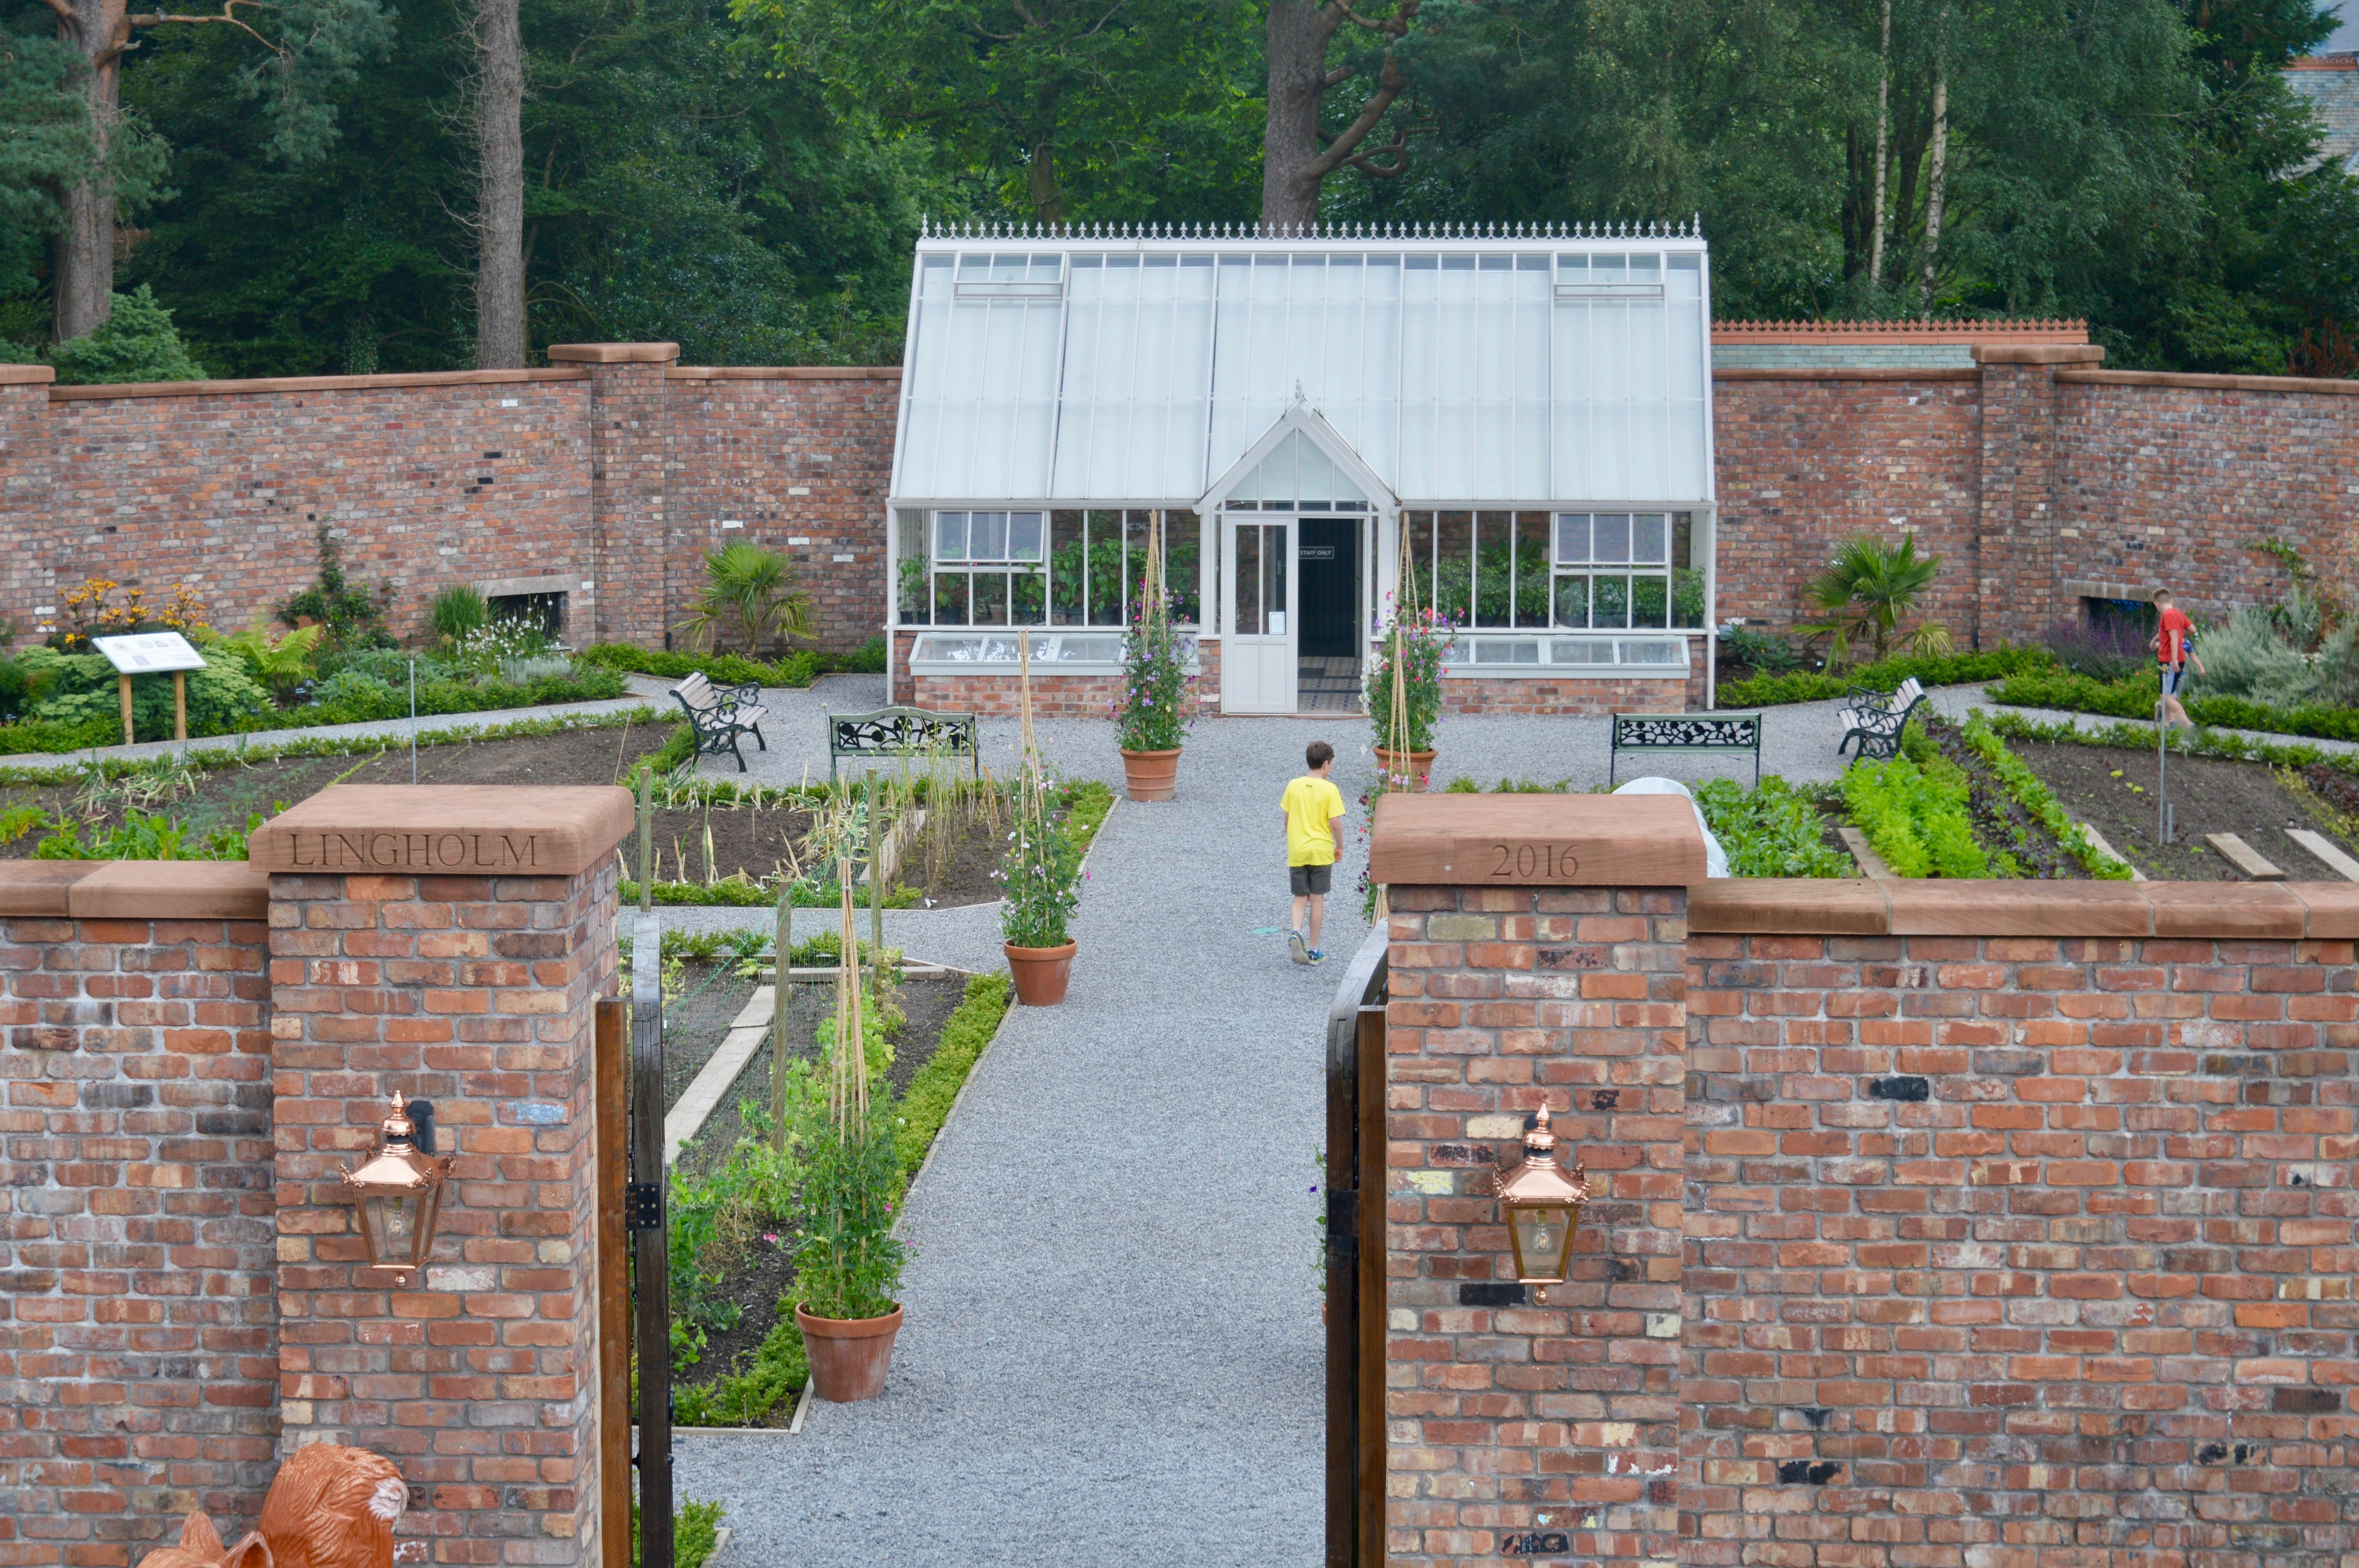 Mr-McGregors-Garden-Beatrix-Potter-Vauxhall-Crossland-X-The-Lingholm-Kitchen-Estate-Keswick-Lake-District-Elle-Blonde-Luxury-Lifestyle-Destination-Blog